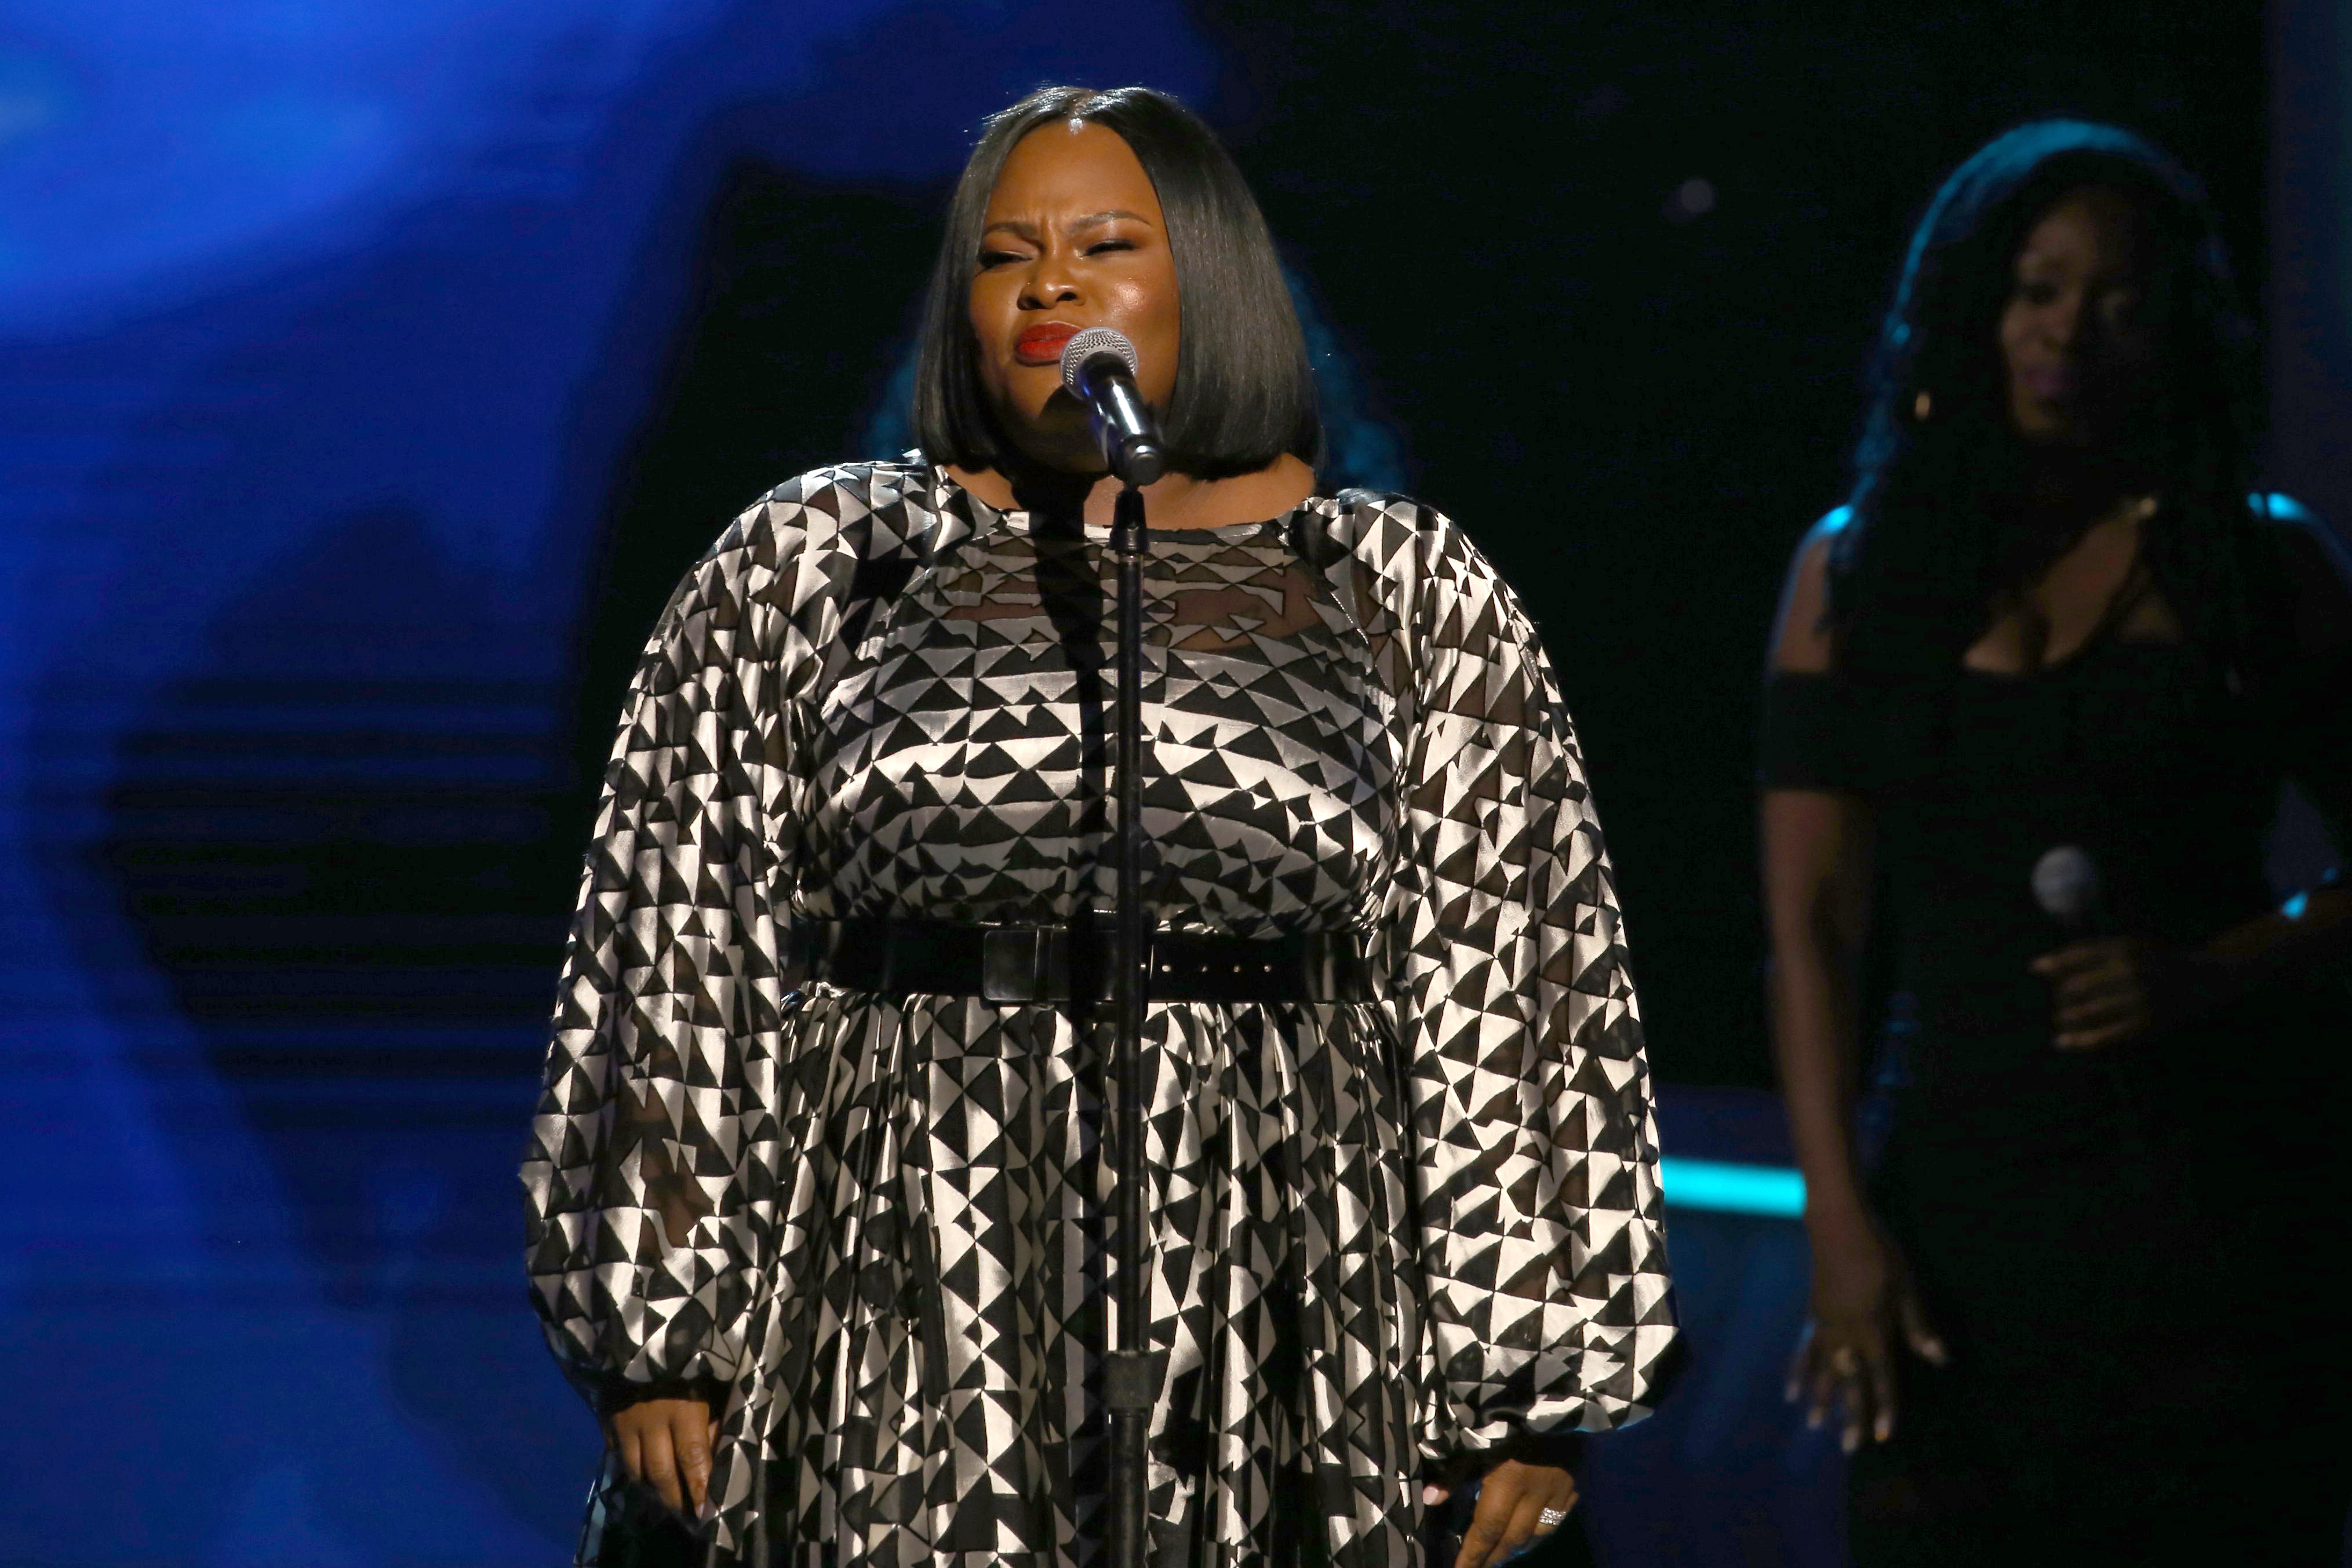 'Black Girls Rock!' hosted By Taraji P. Henson